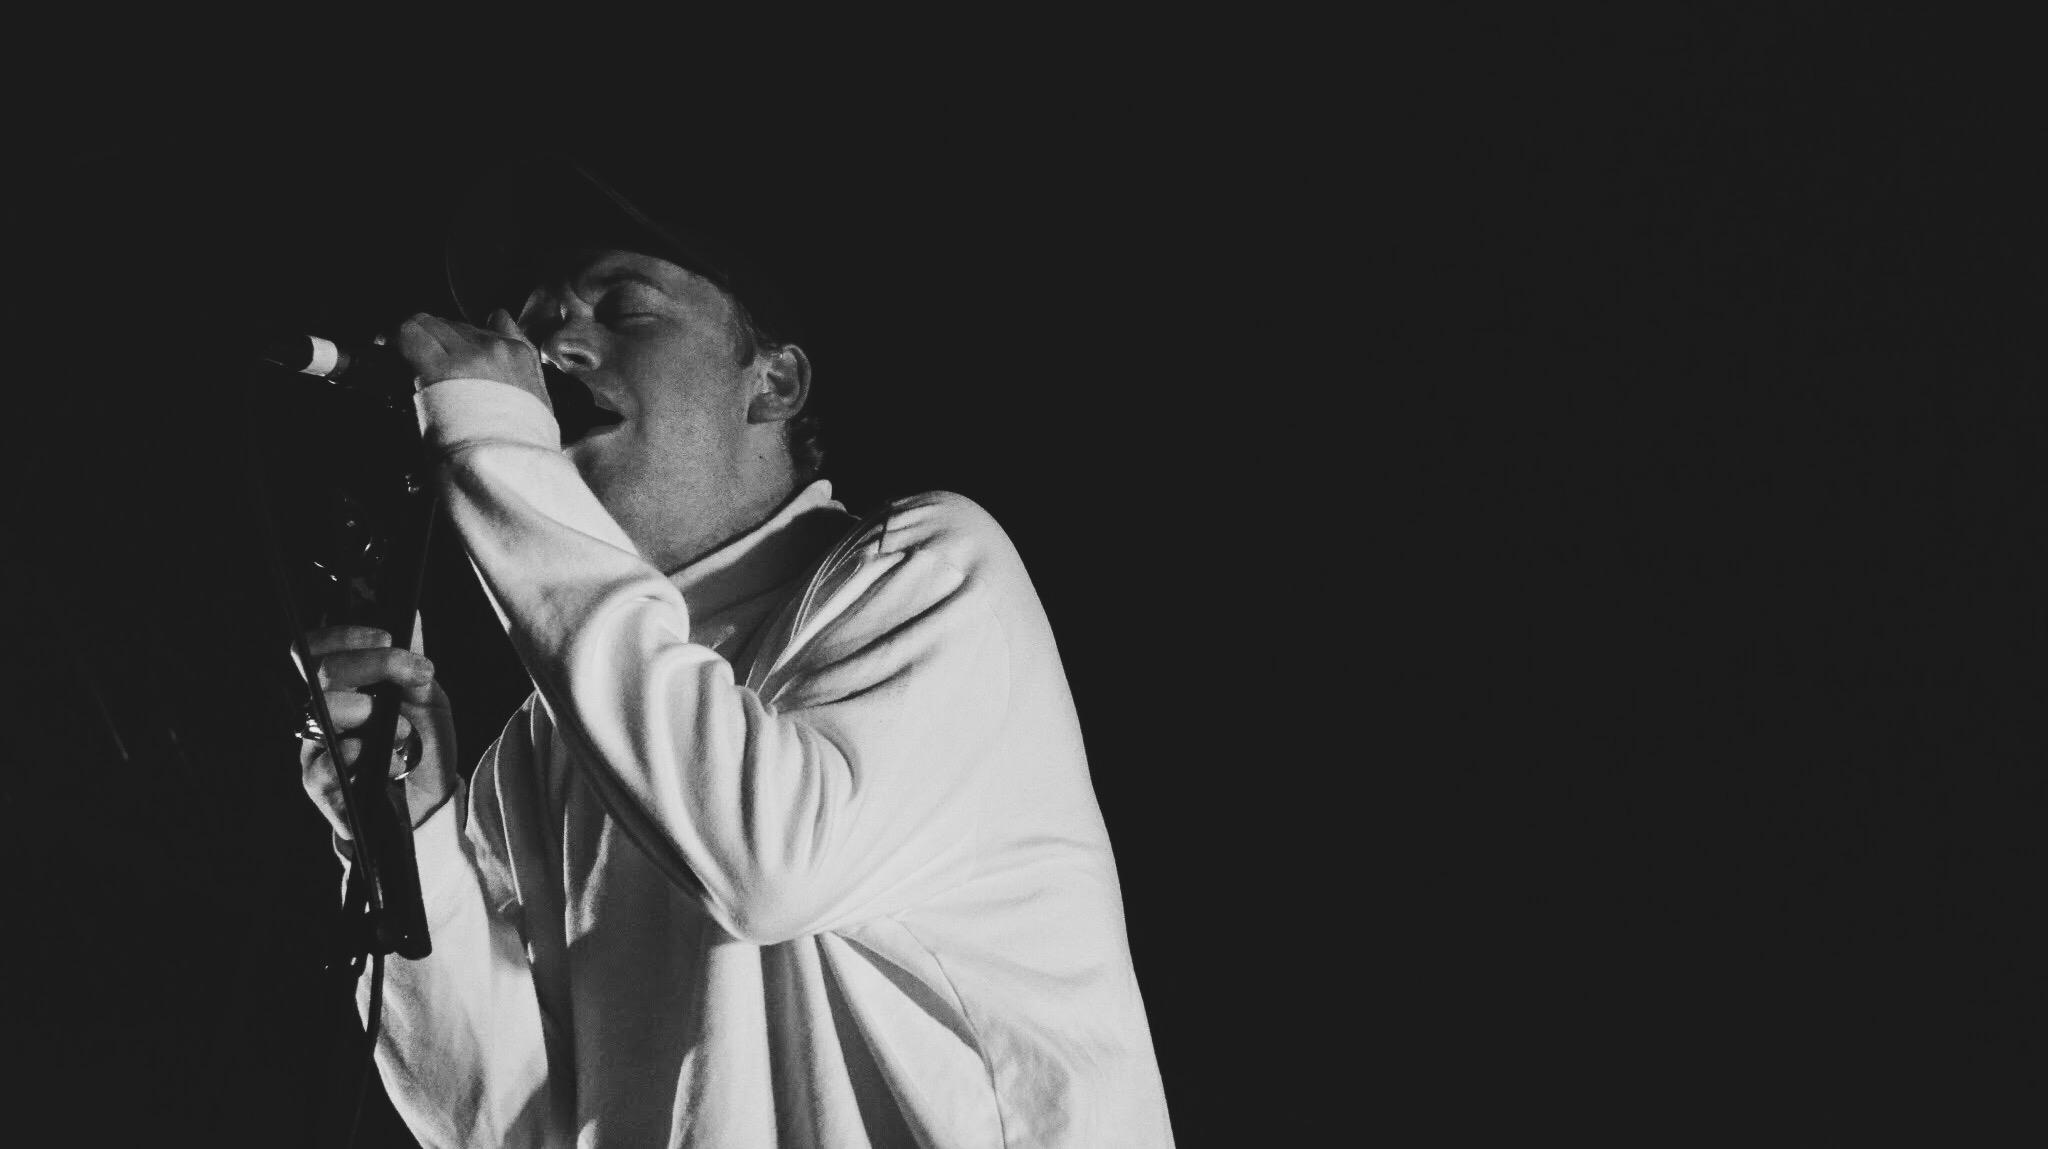 dmas music live review melbourne photo credit ryley clarke savage thrills savagethrills 12